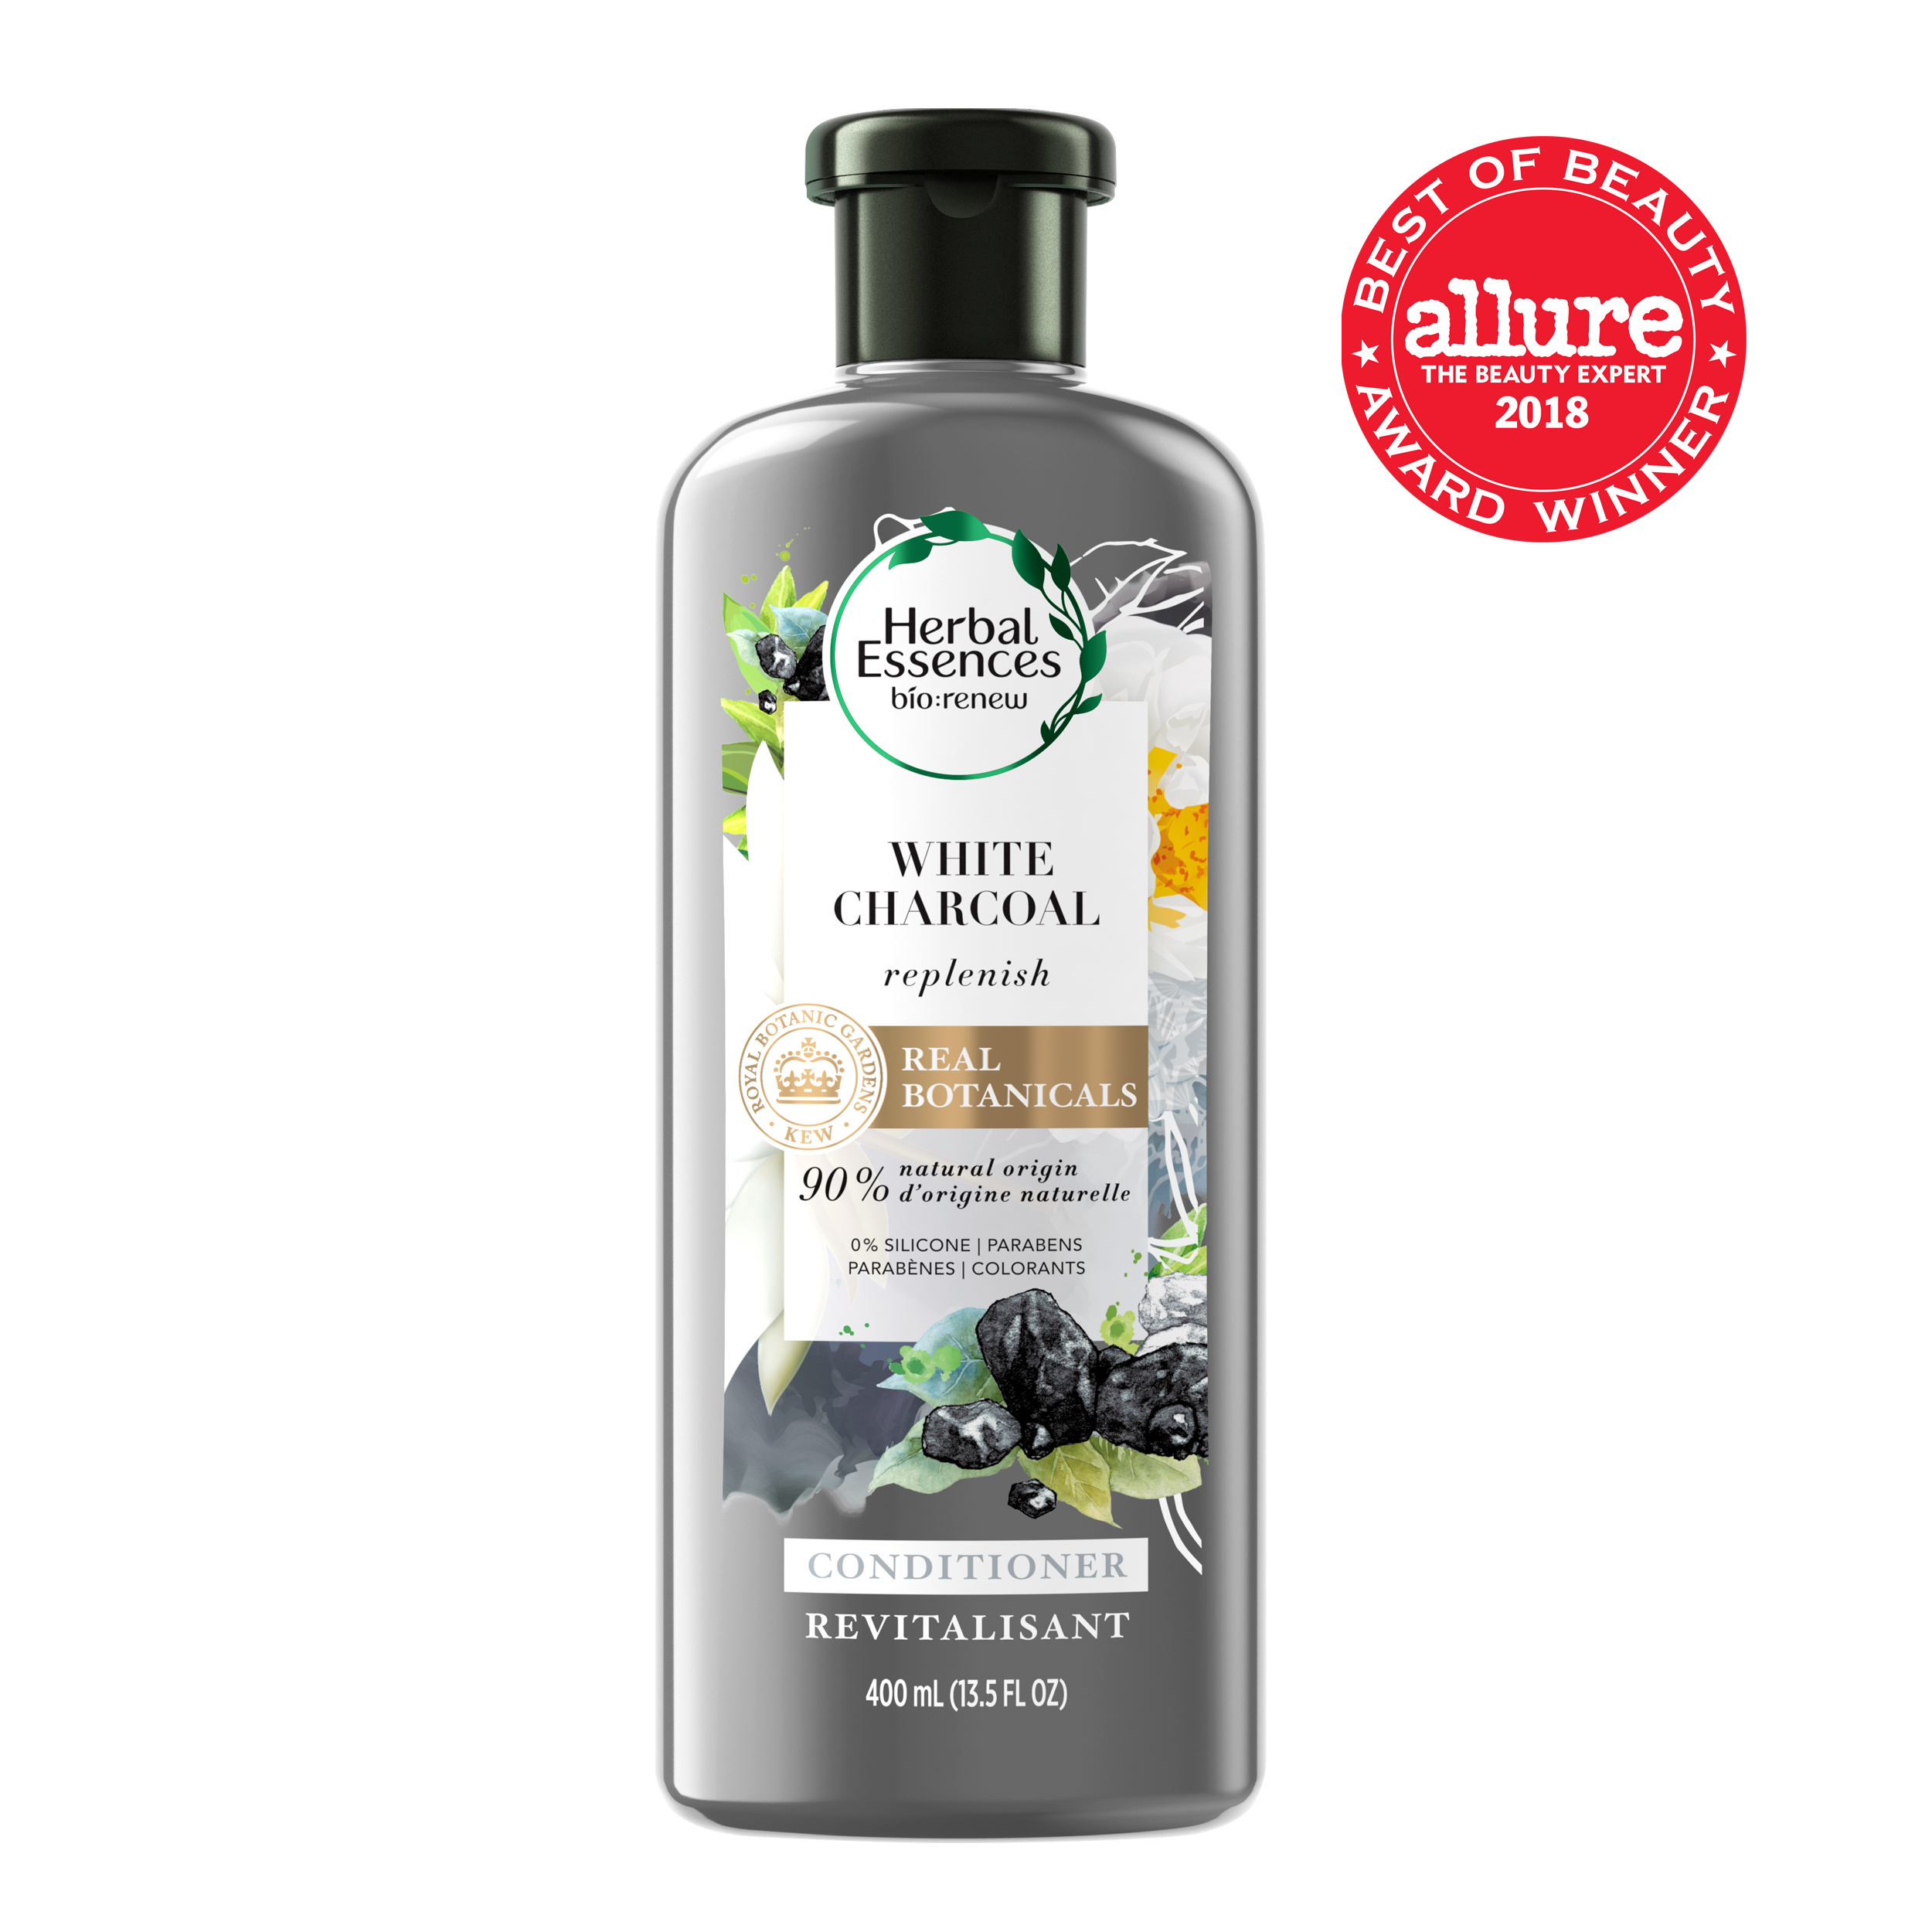 Herbal Essences bio:renew Replenish White Charcoal Conditioner, 13.5 fl oz